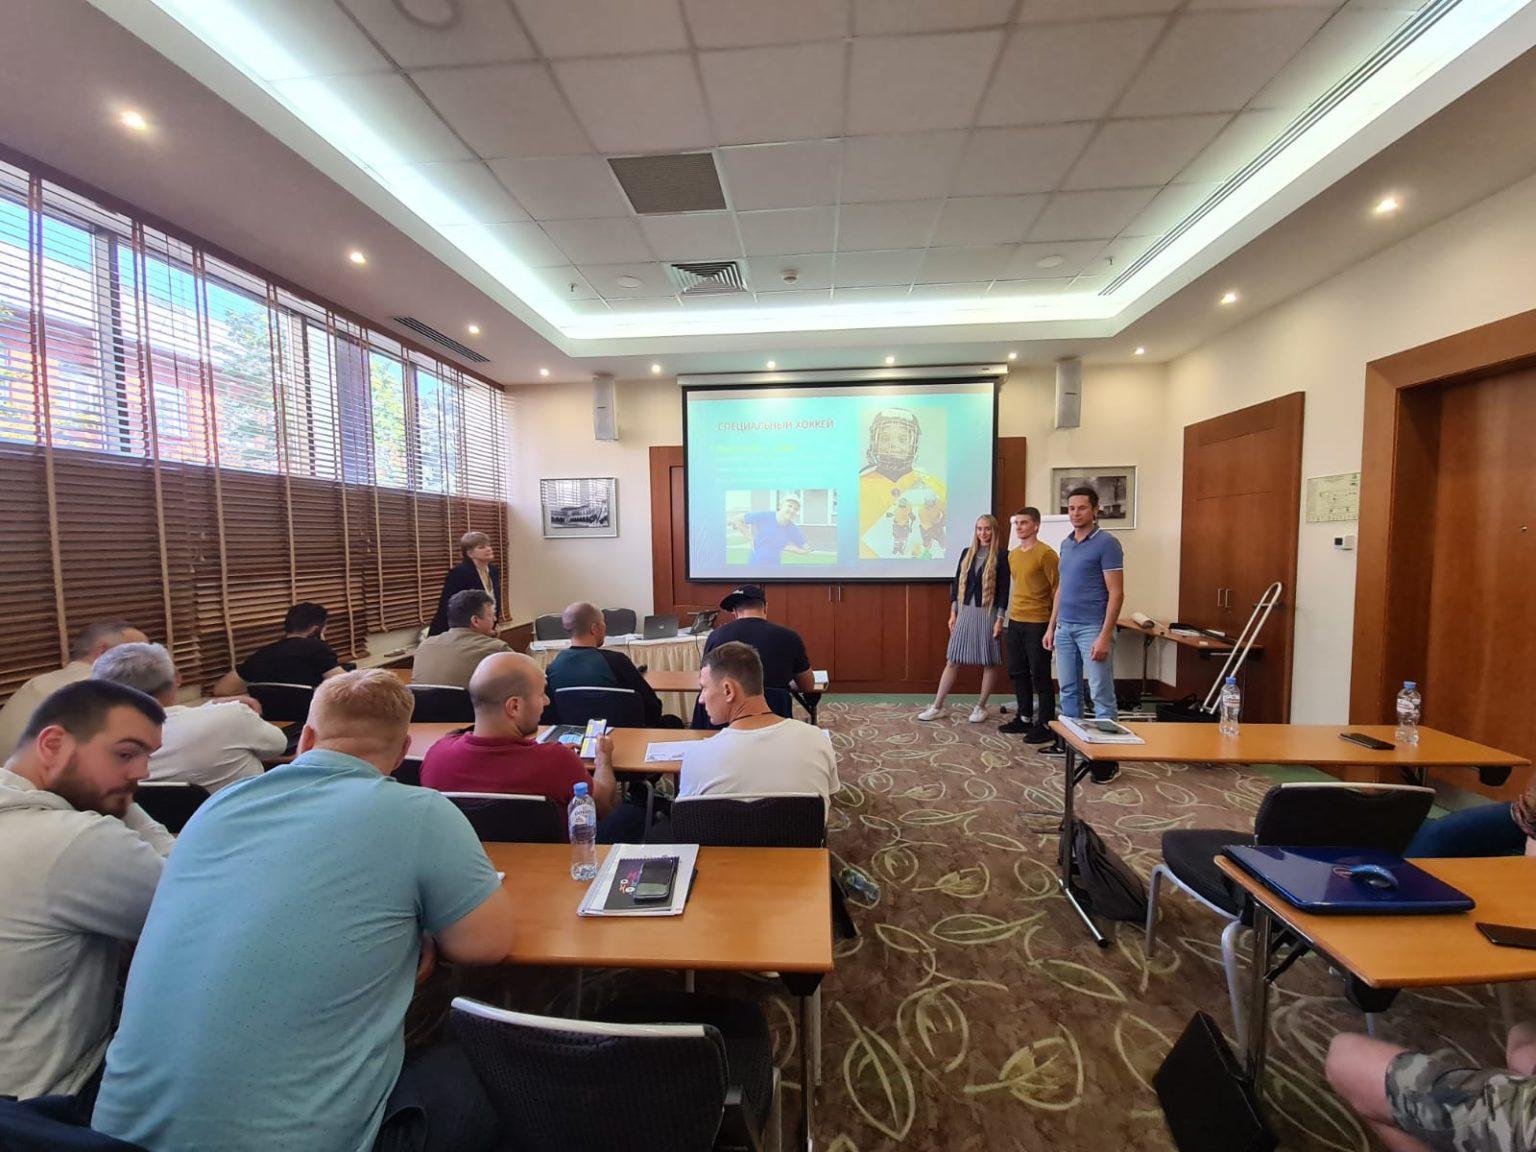 shkola-trenerov-1536x1152